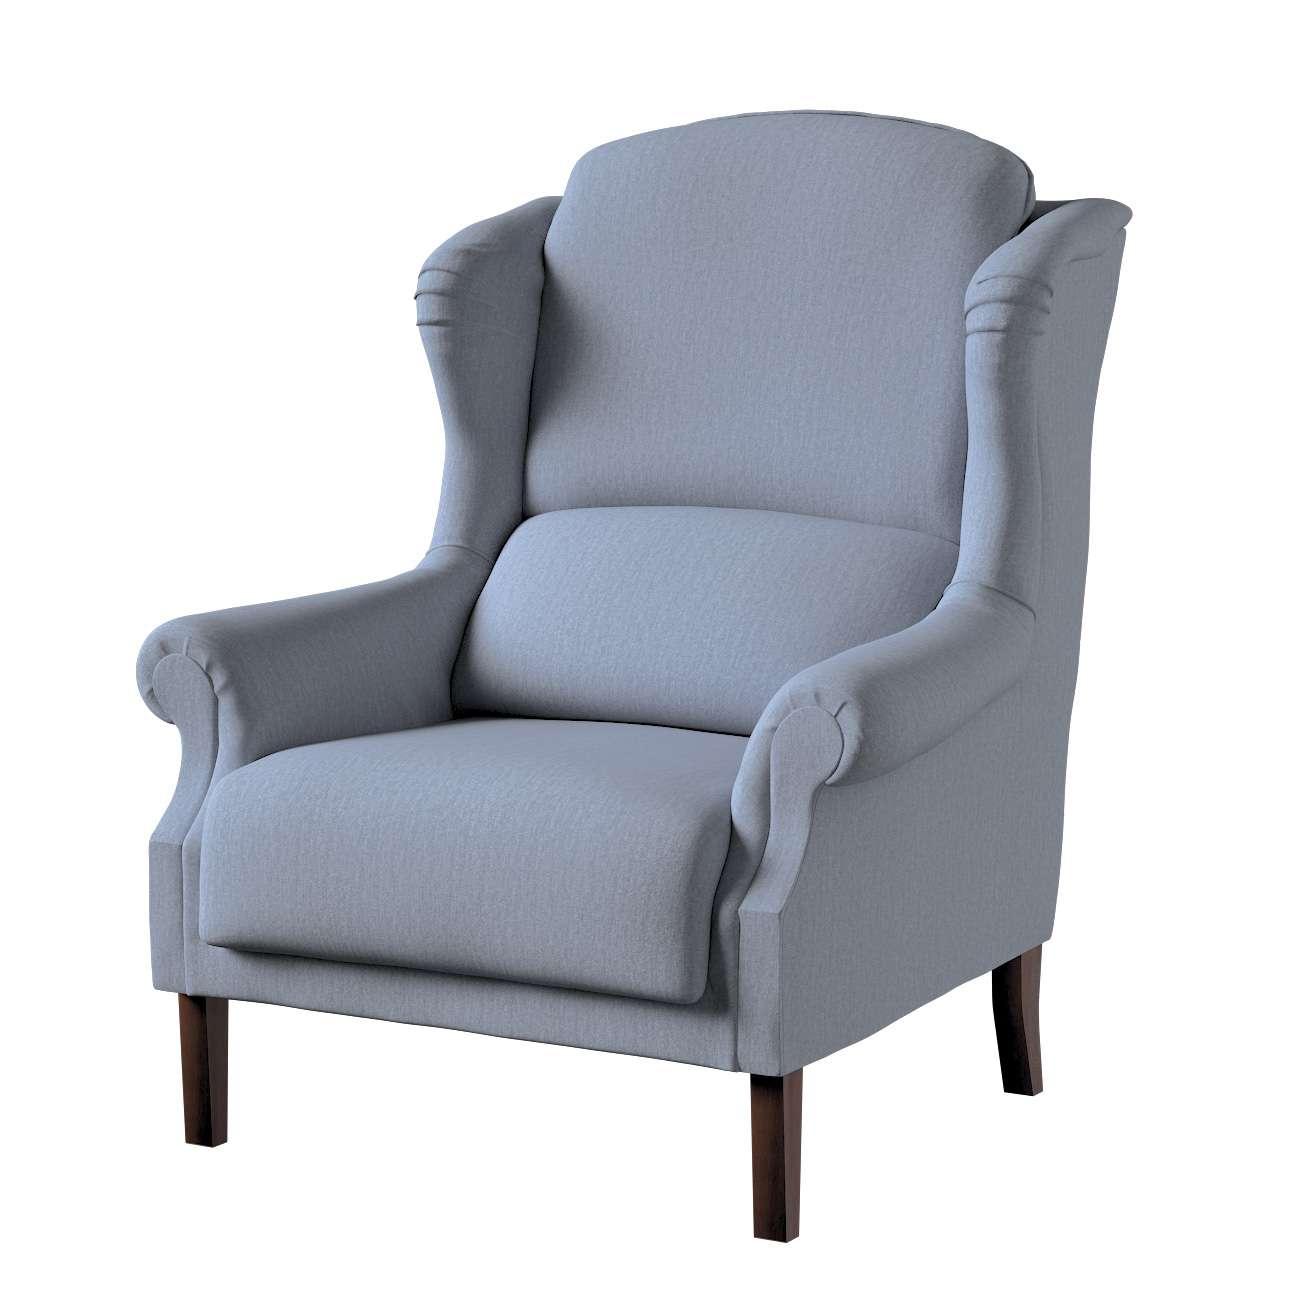 Fotel Unique w kolekcji Chenille, tkanina: 702-13